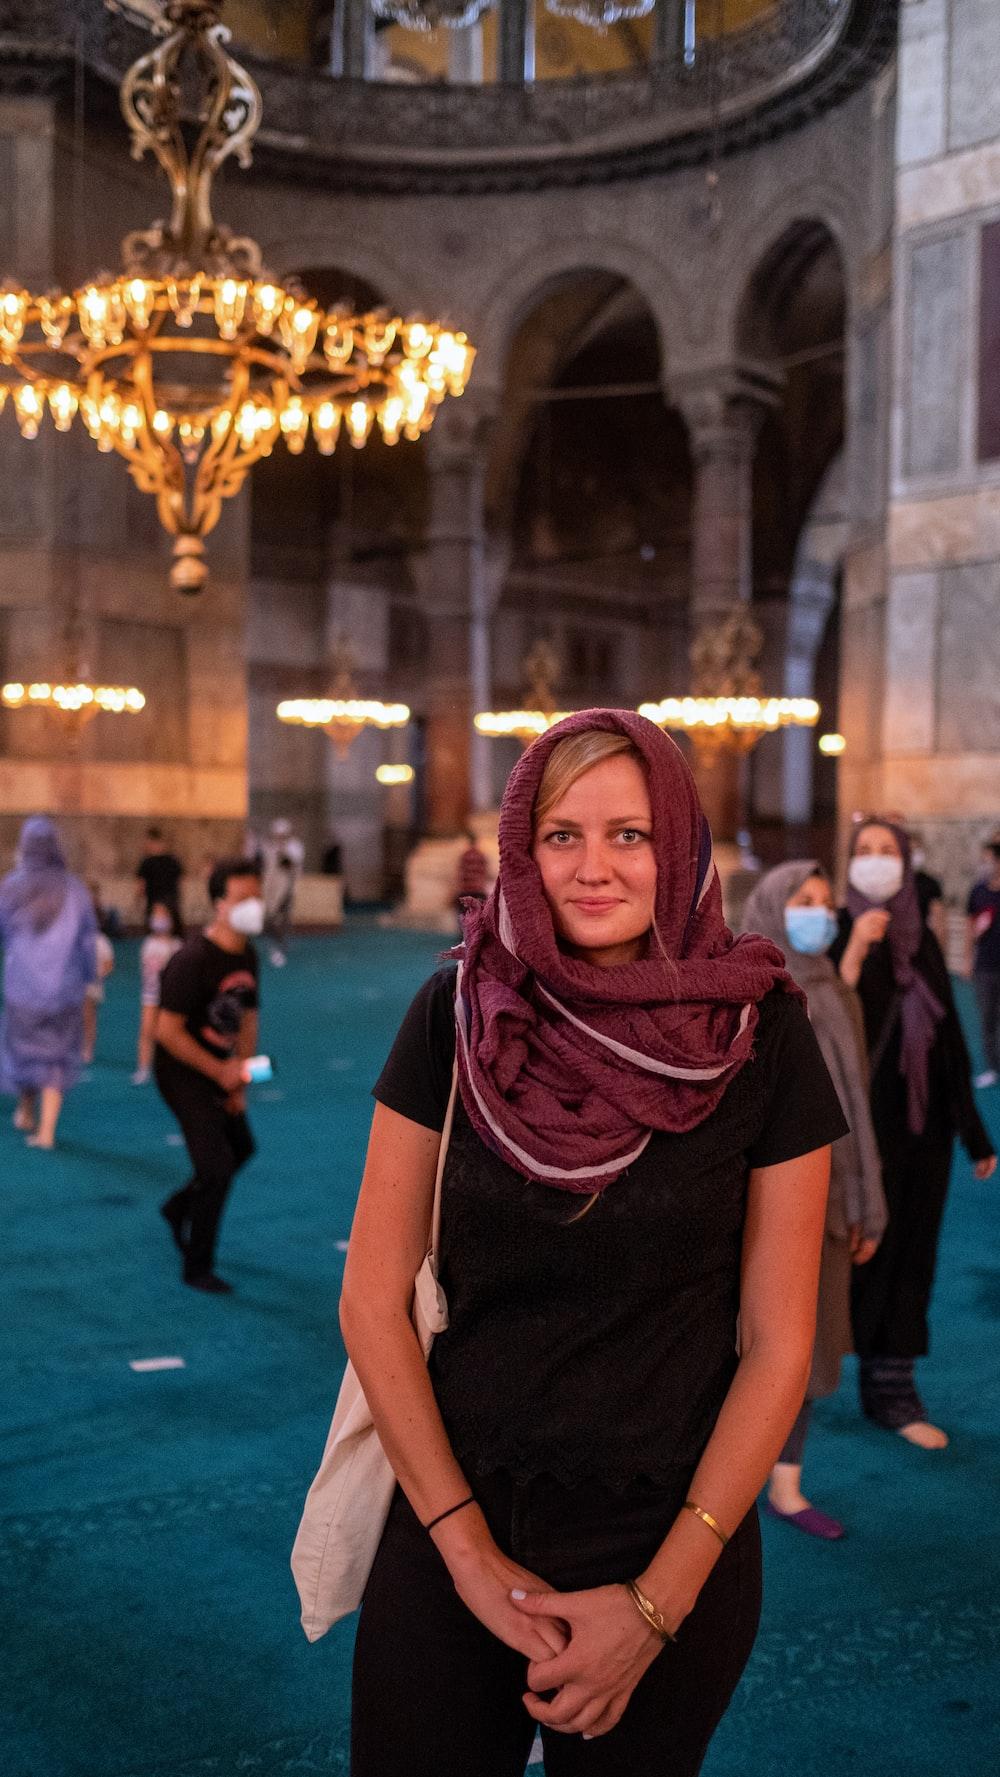 woman in black shirt and purple hijab